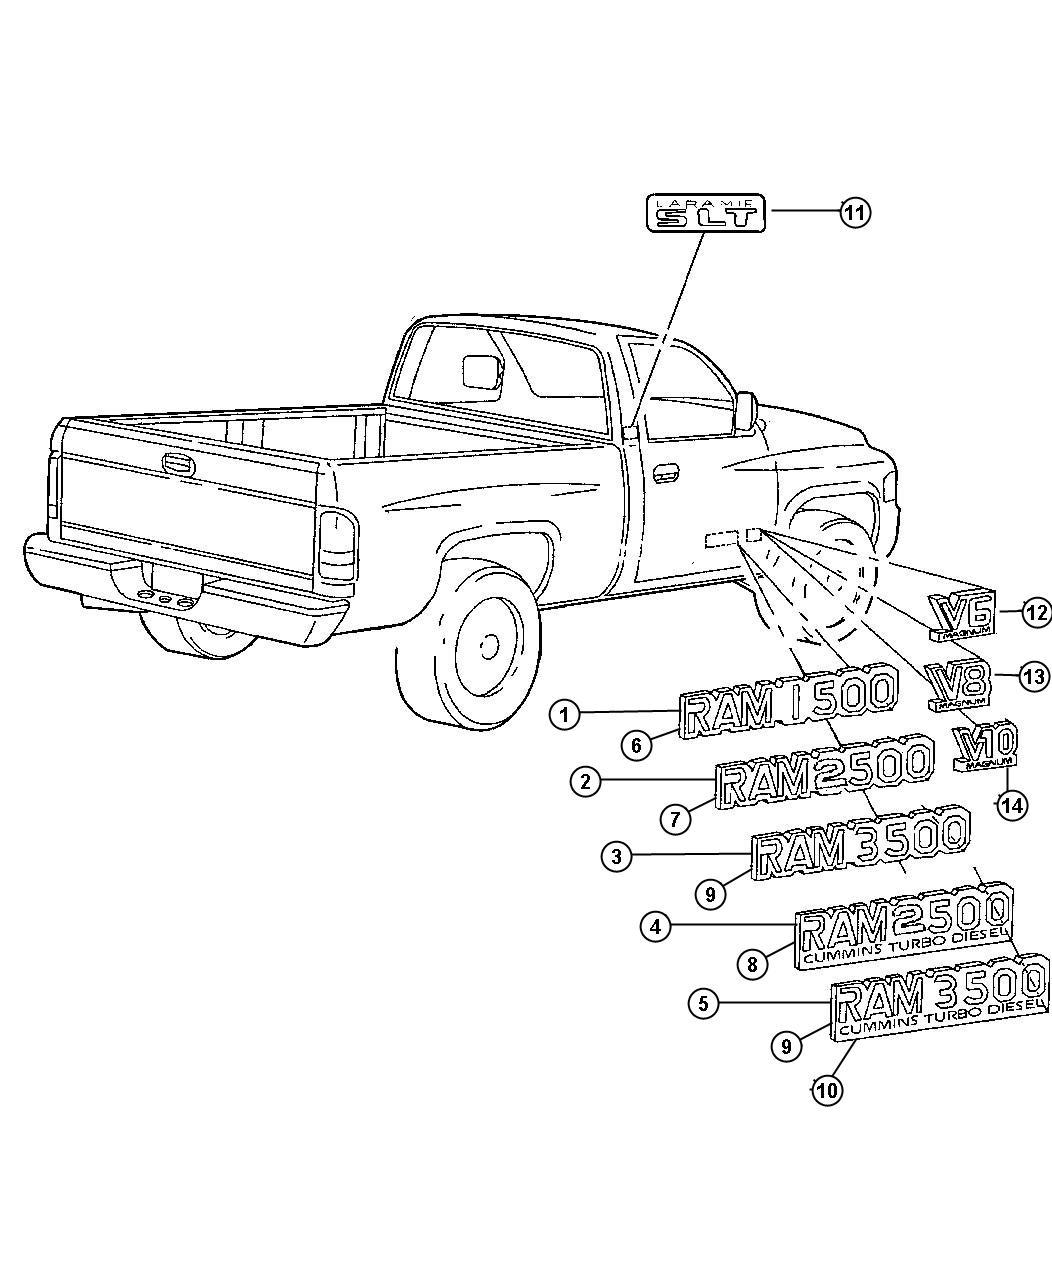 1998 Dodge Ram 3500 Nameplate. Front fender. Ram 2500